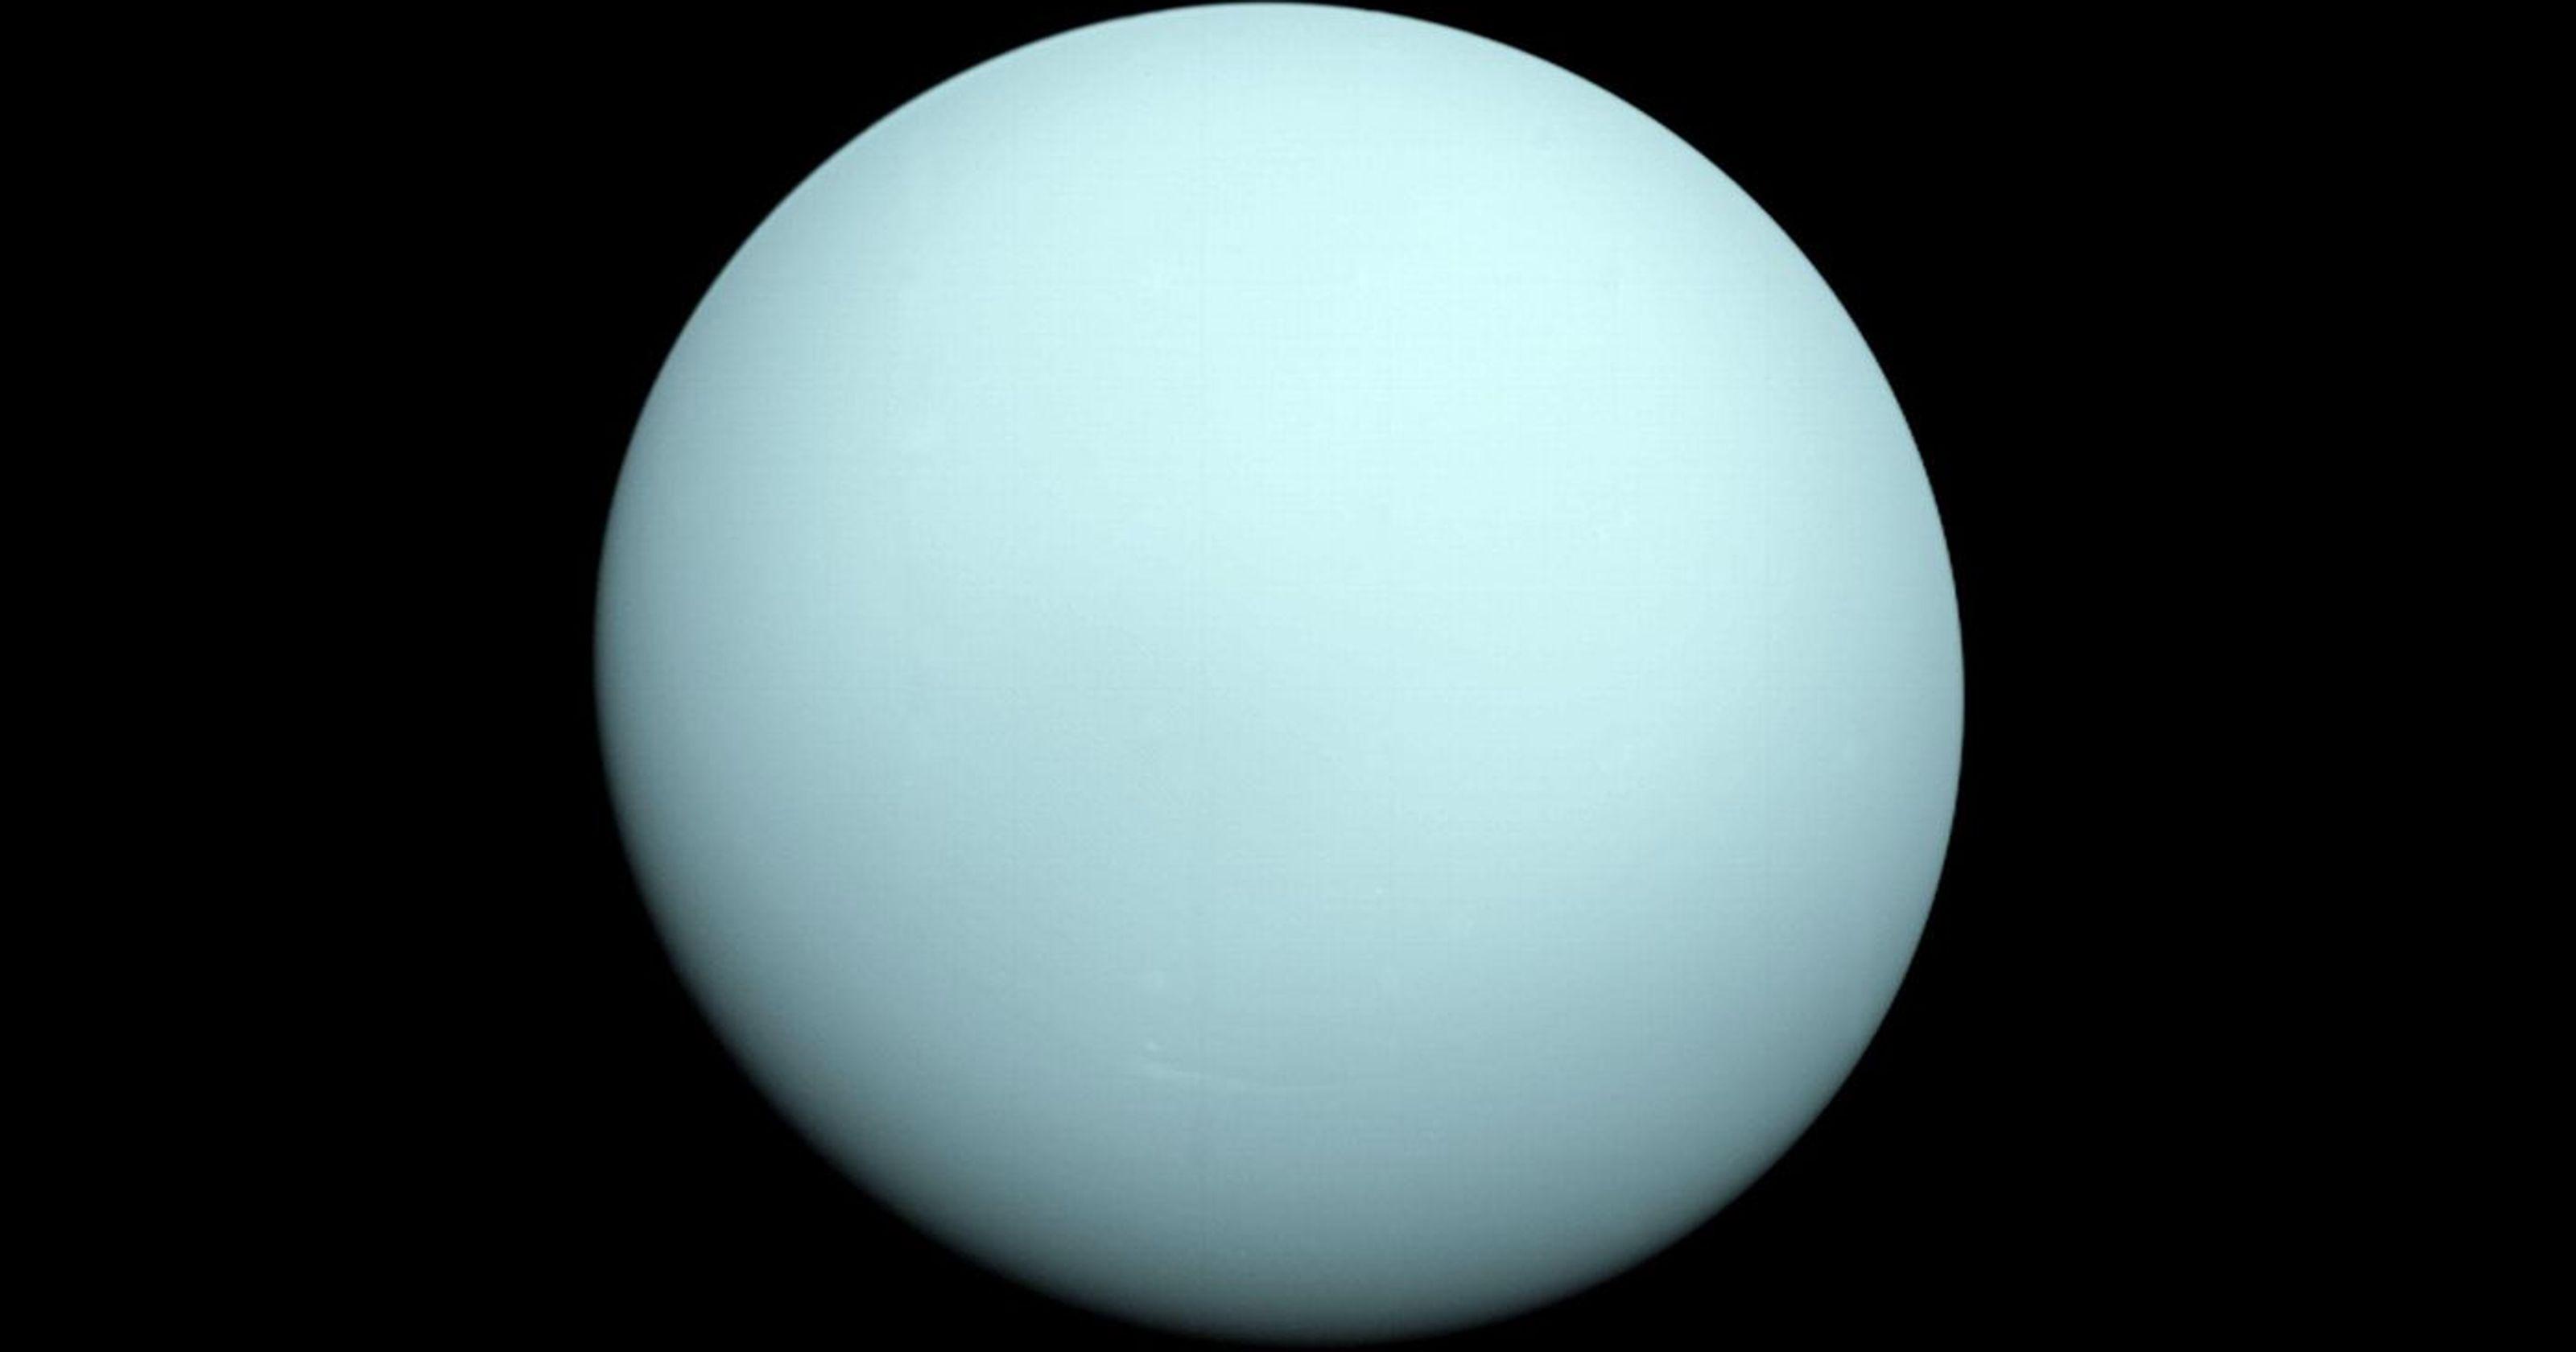 31 Geeky Things to Celebrate in March 2019 | Uranus